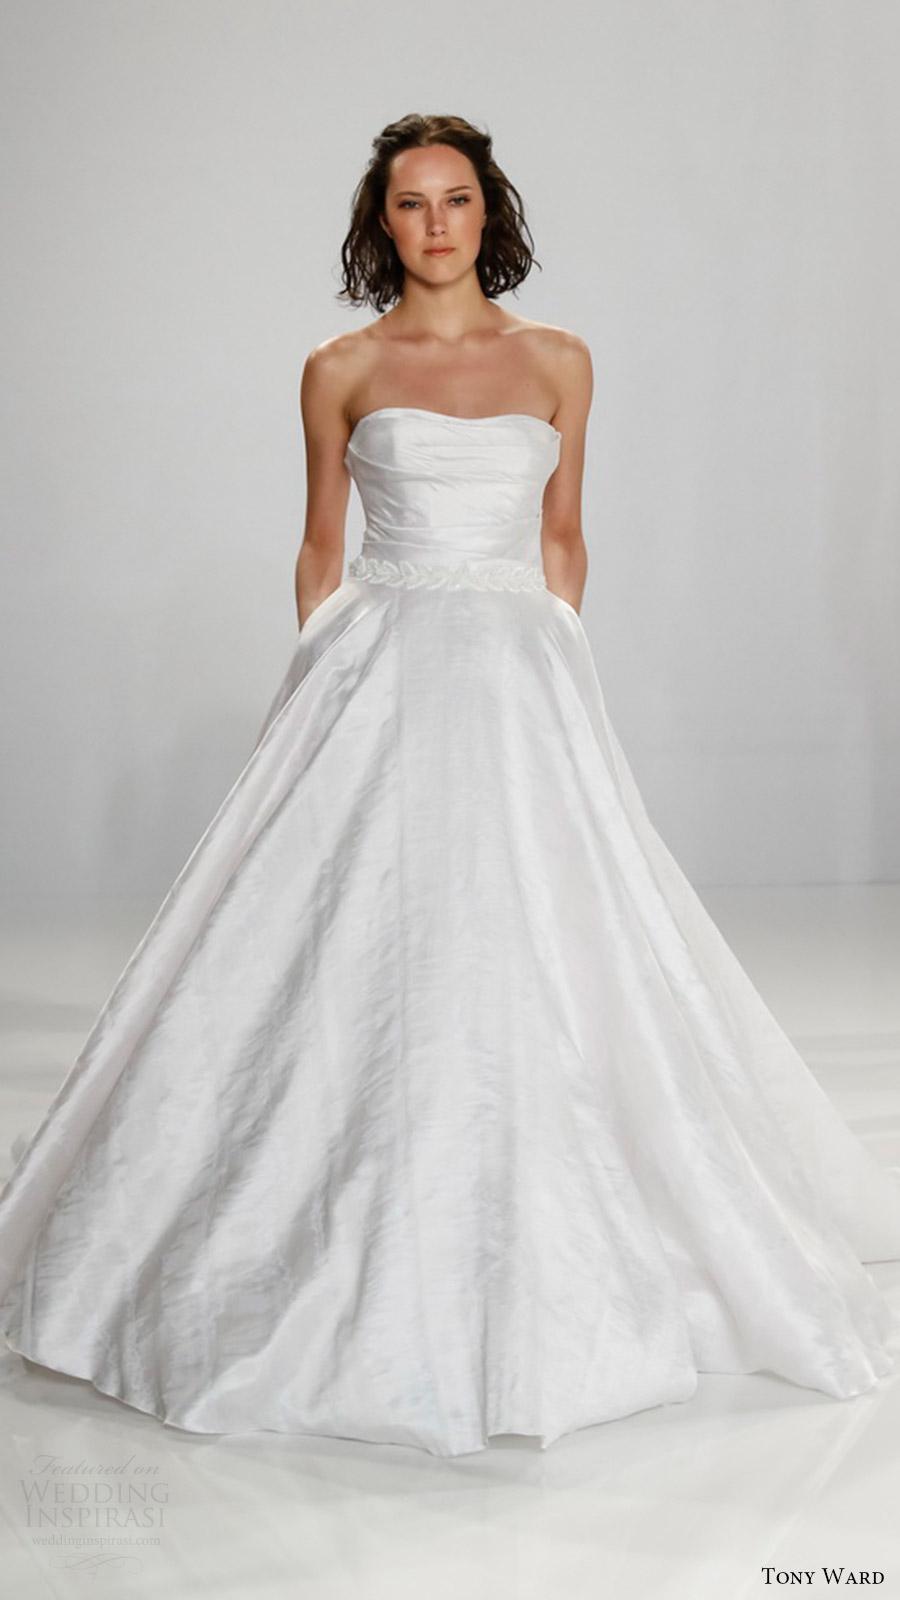 Tony ward bridal 2017 wedding dresses wedding inspirasi for Tony ward wedding dresses